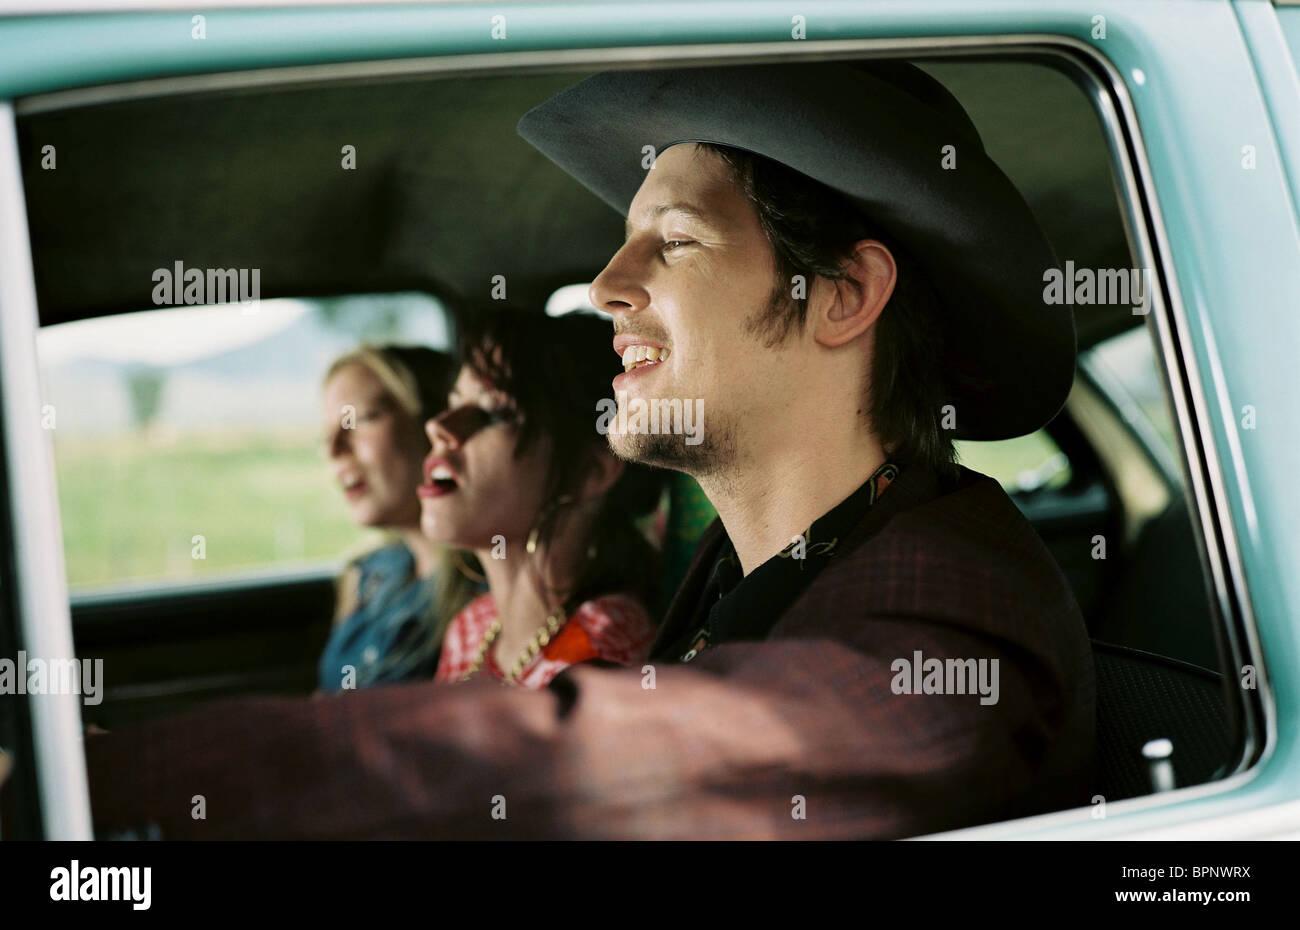 SARAH POLLEY FAIRUZA BALK & GABRIEL MANN DON'T COME KNOCKING (2005) - Stock Image